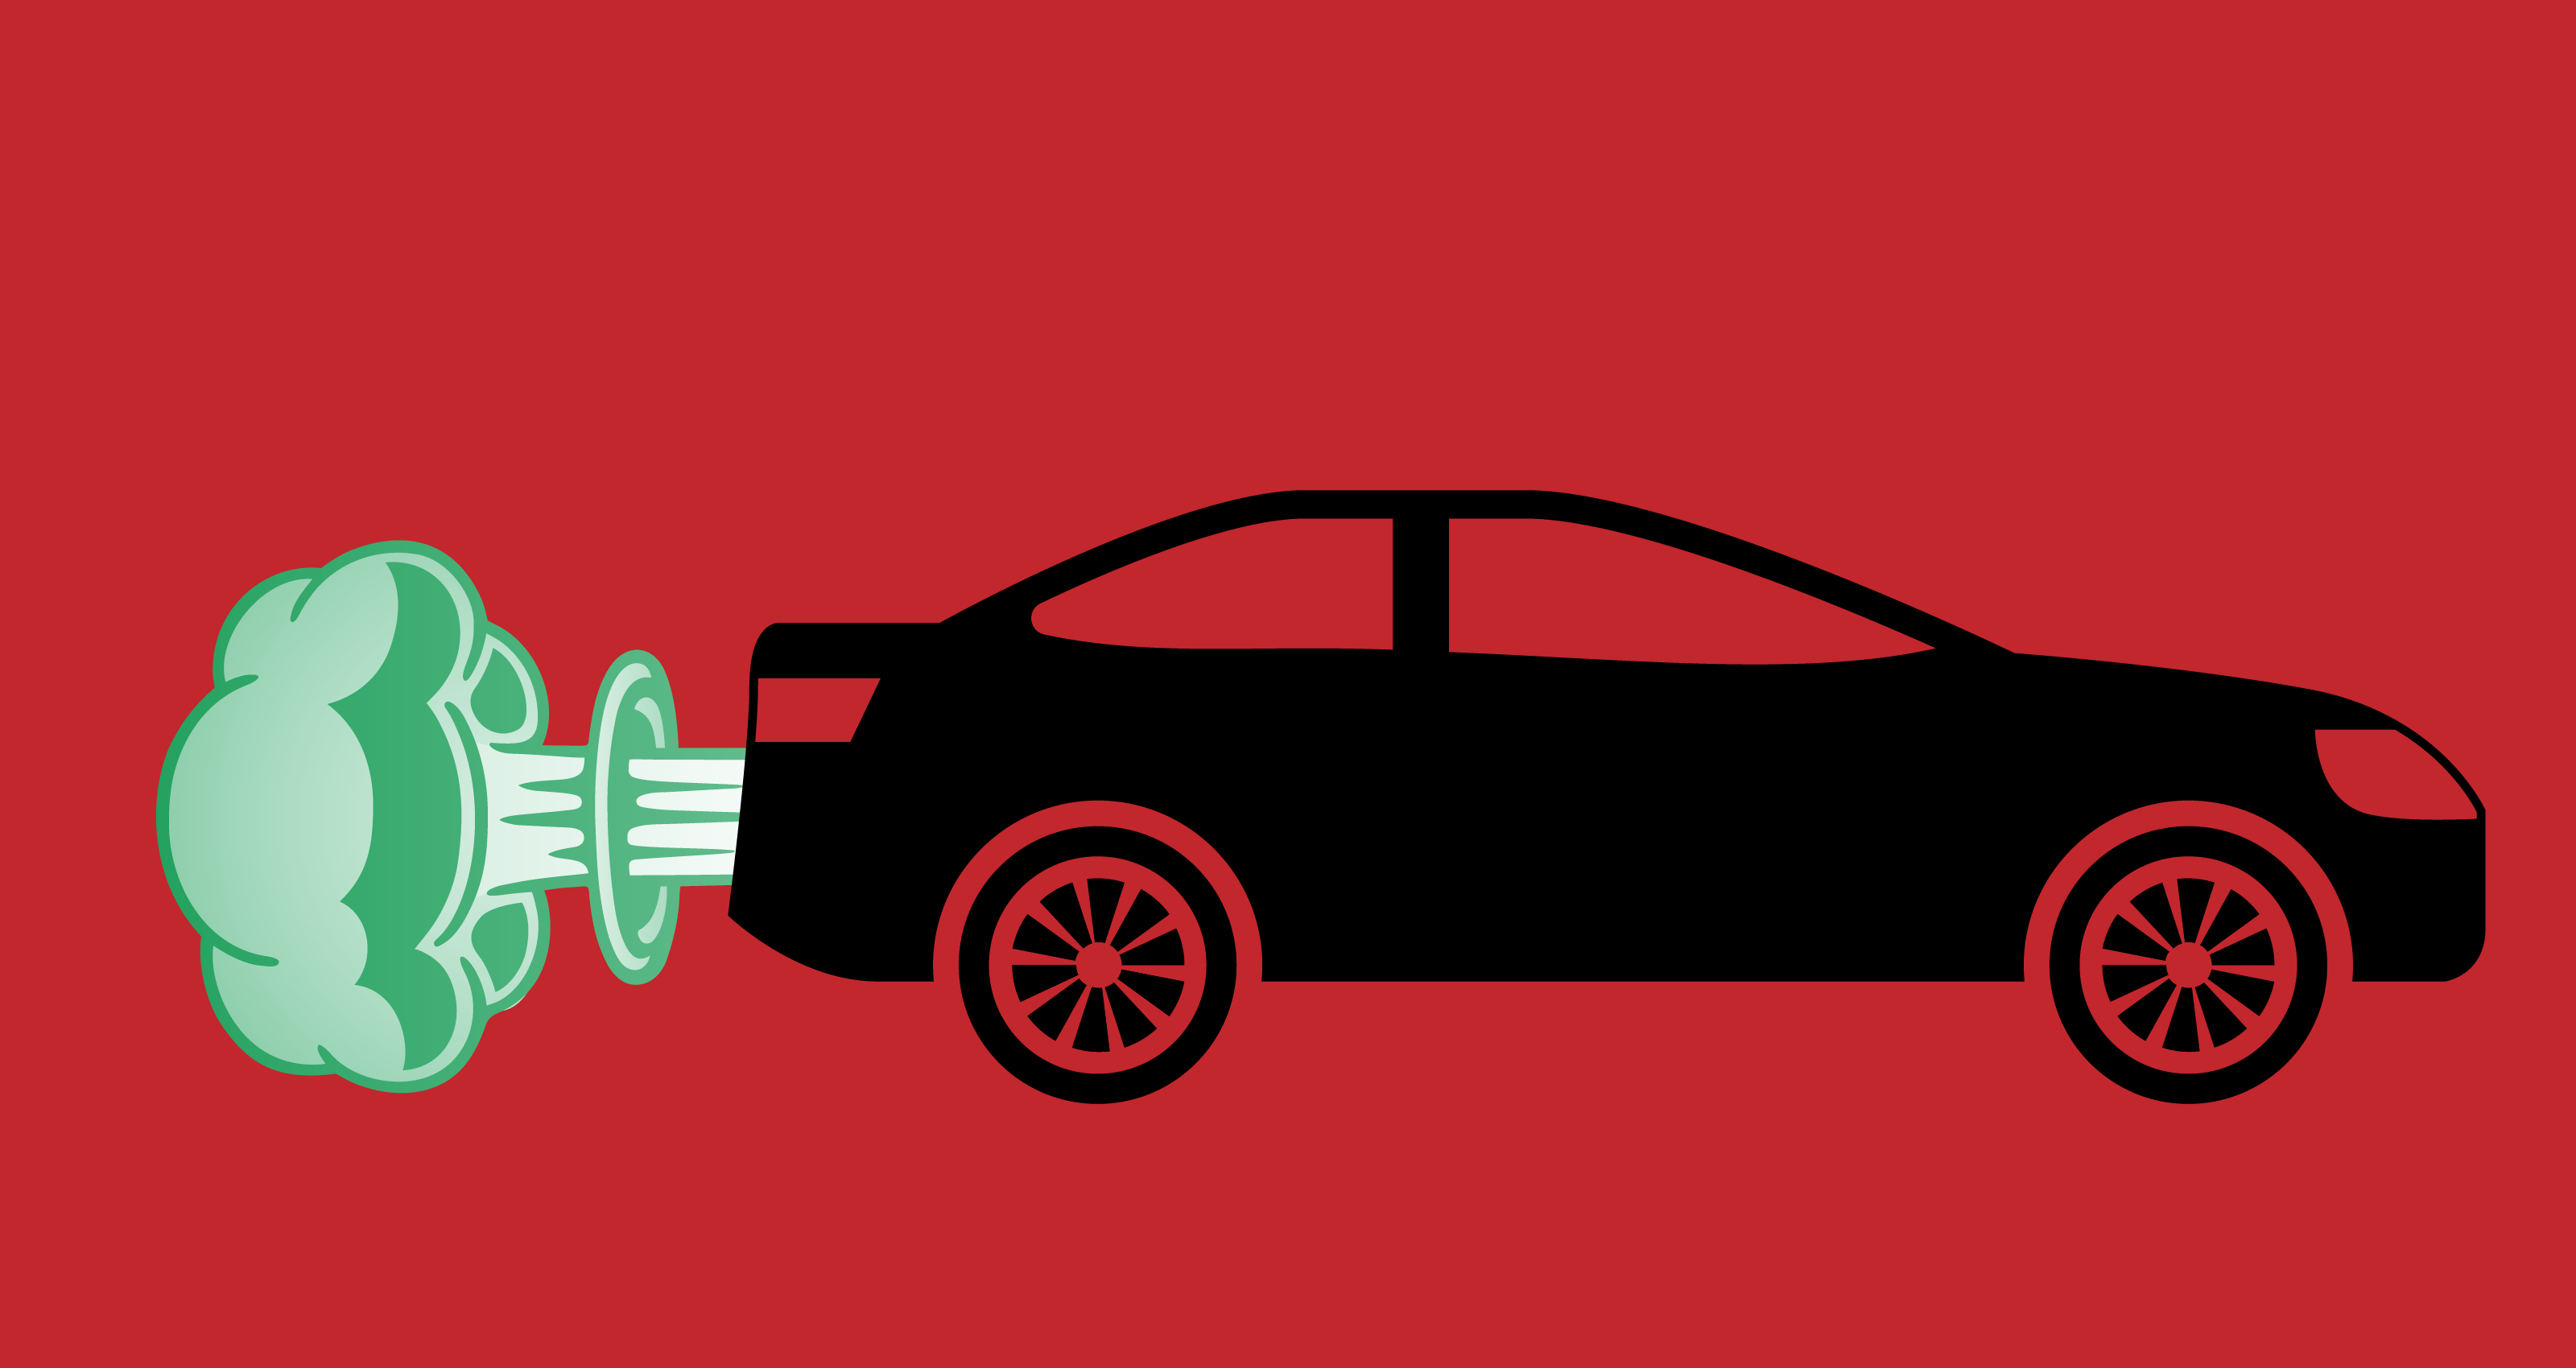 Стивен Кинг о режиме пердежа в Tesla: «весьма нелепо… хотя в то же время и забавно» 1